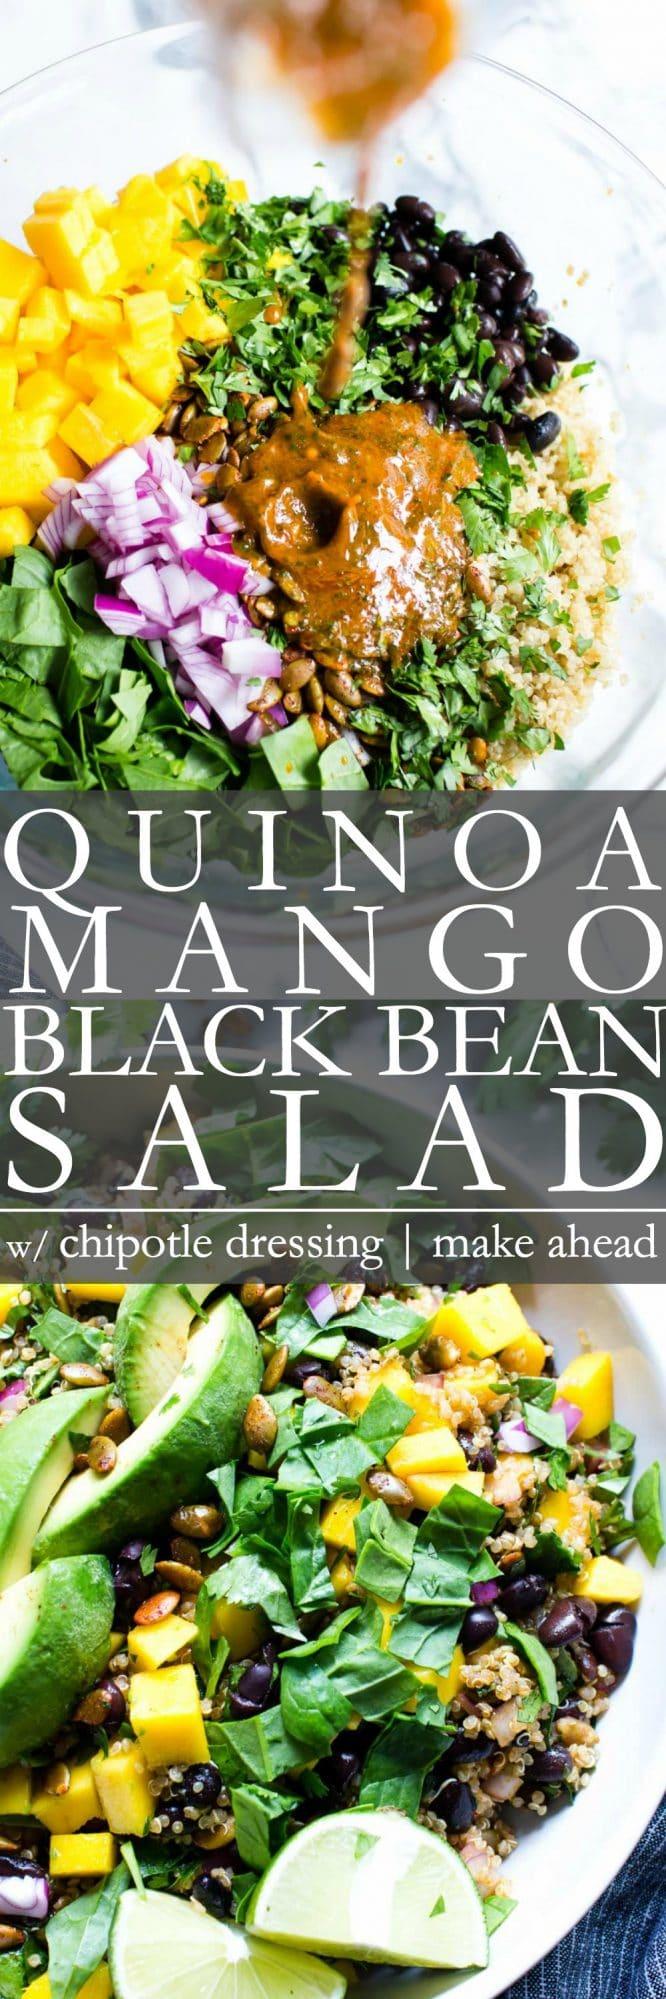 Pinterest Pin for Black Bean Quinoa Salad